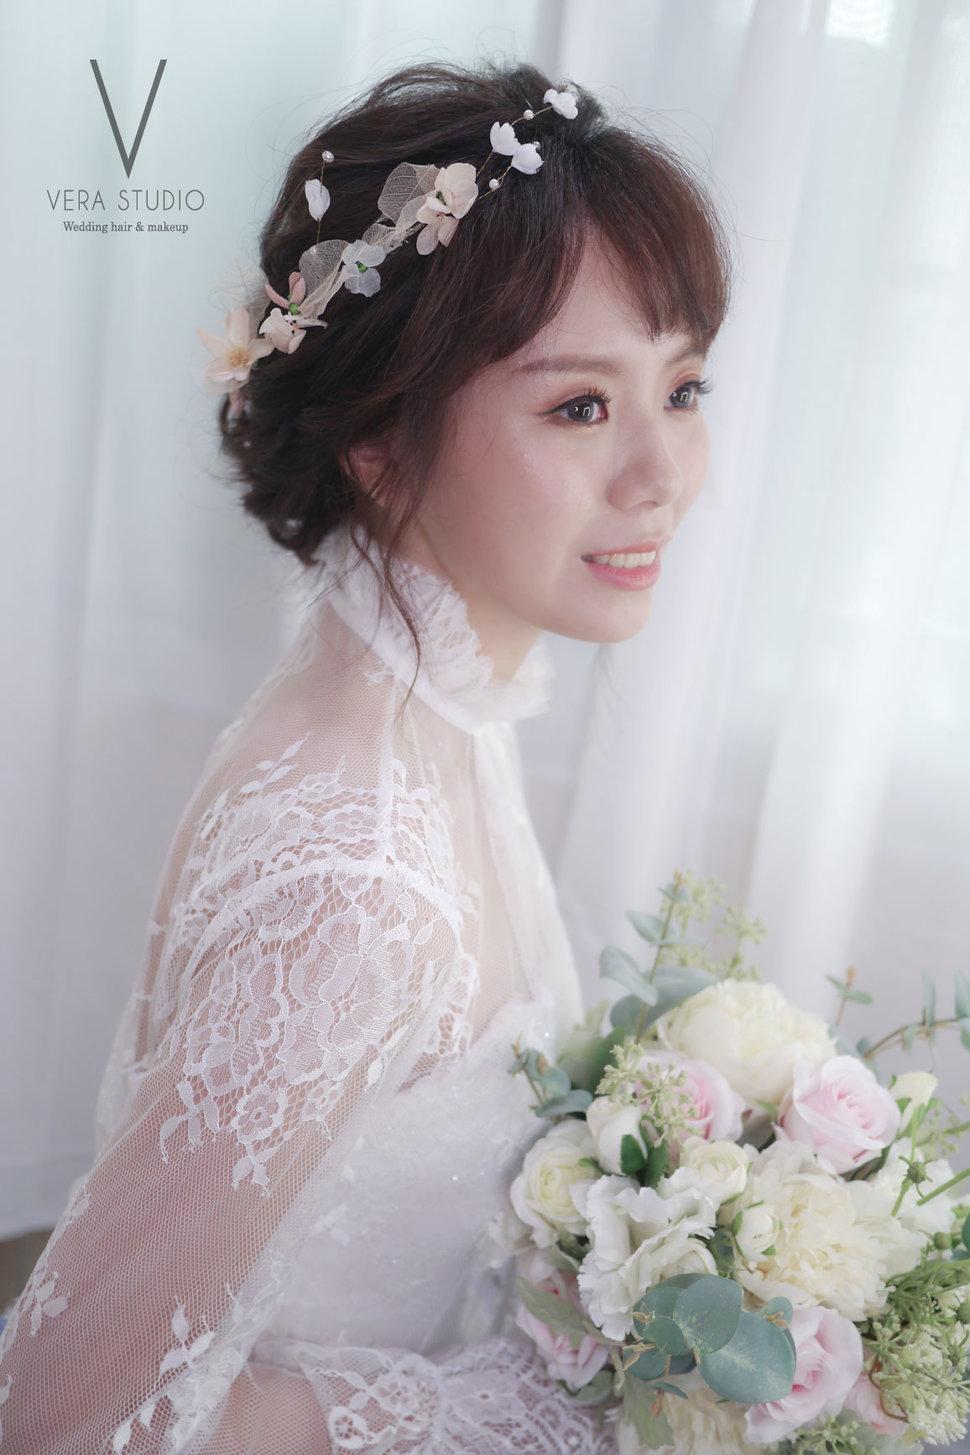 07 - Vera Studio 薇拉整體造型《結婚吧》